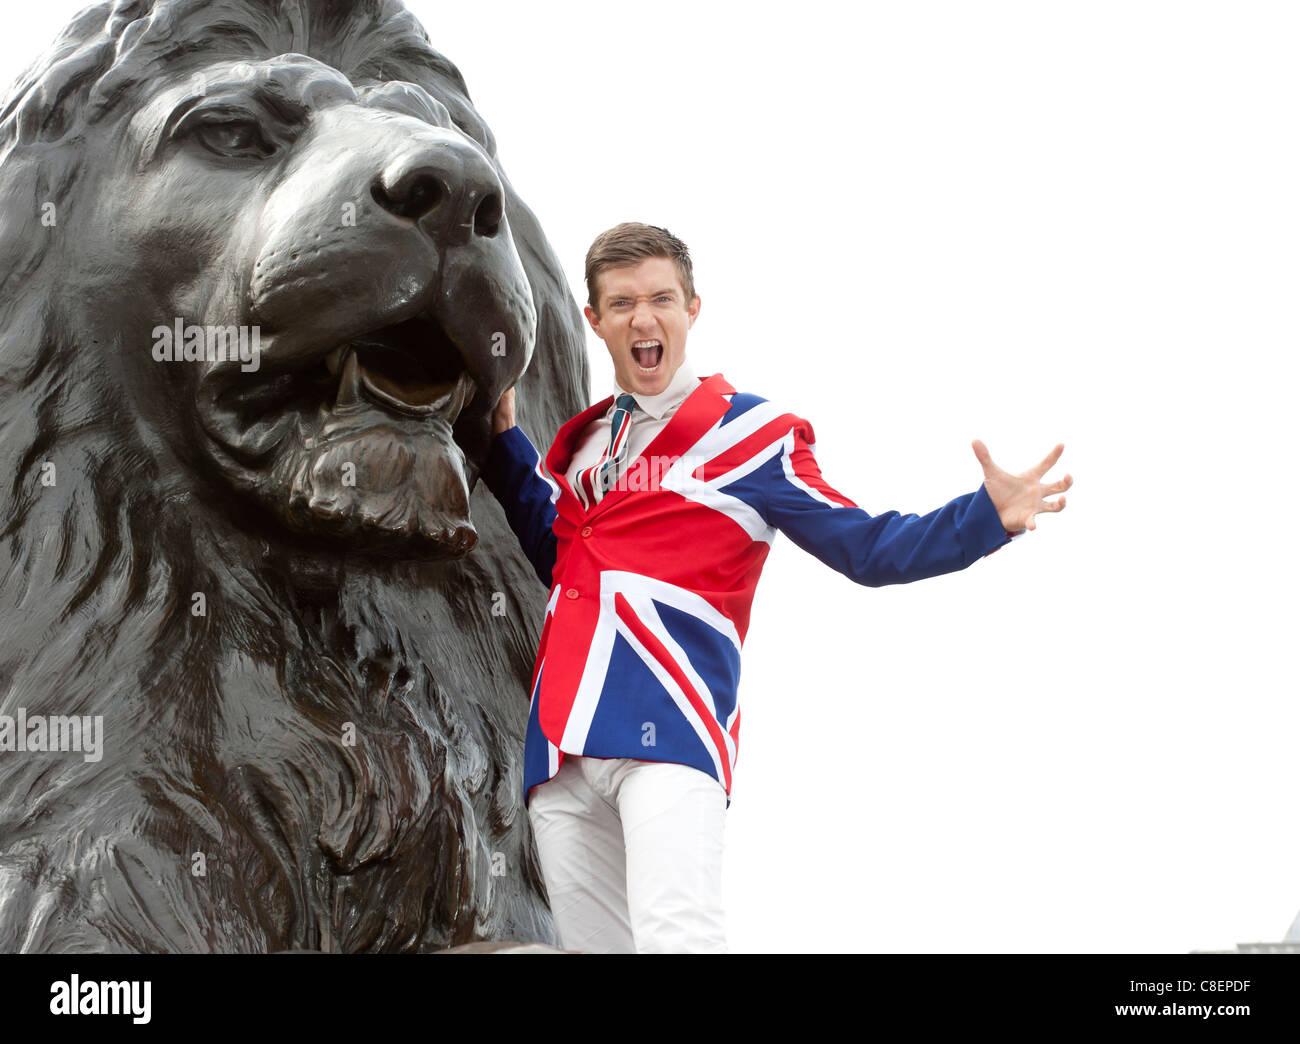 Junger Mann mit Union Jack jacket Brausen neben dem Lion Statue, Trafalgar Square, London, England Stockbild